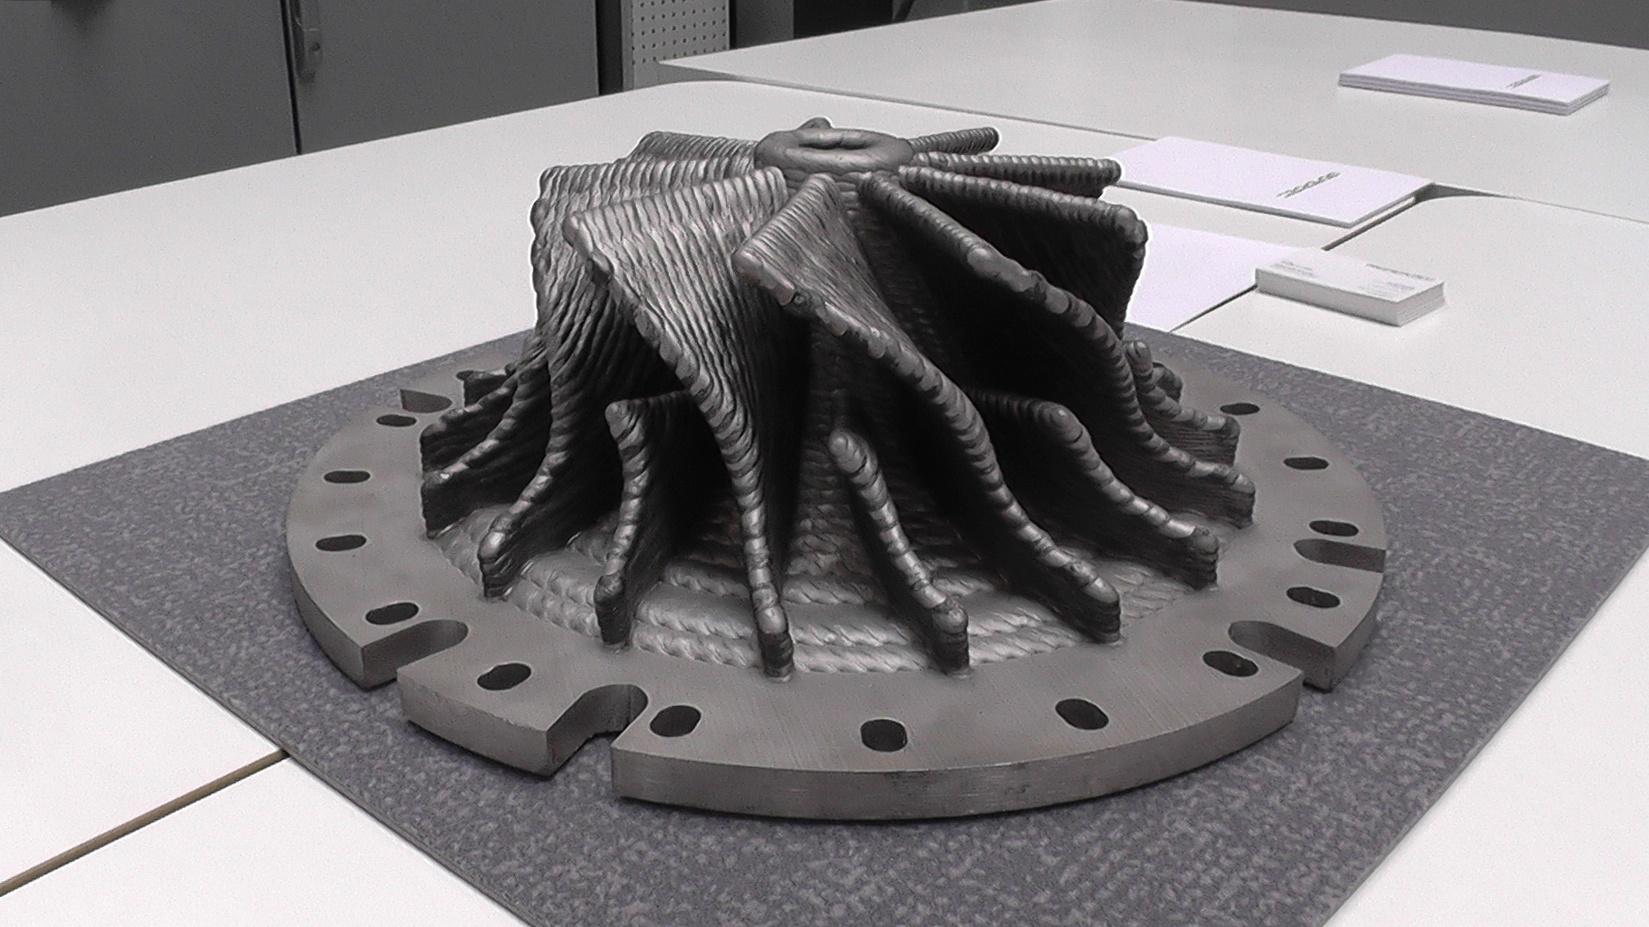 metal Printed part